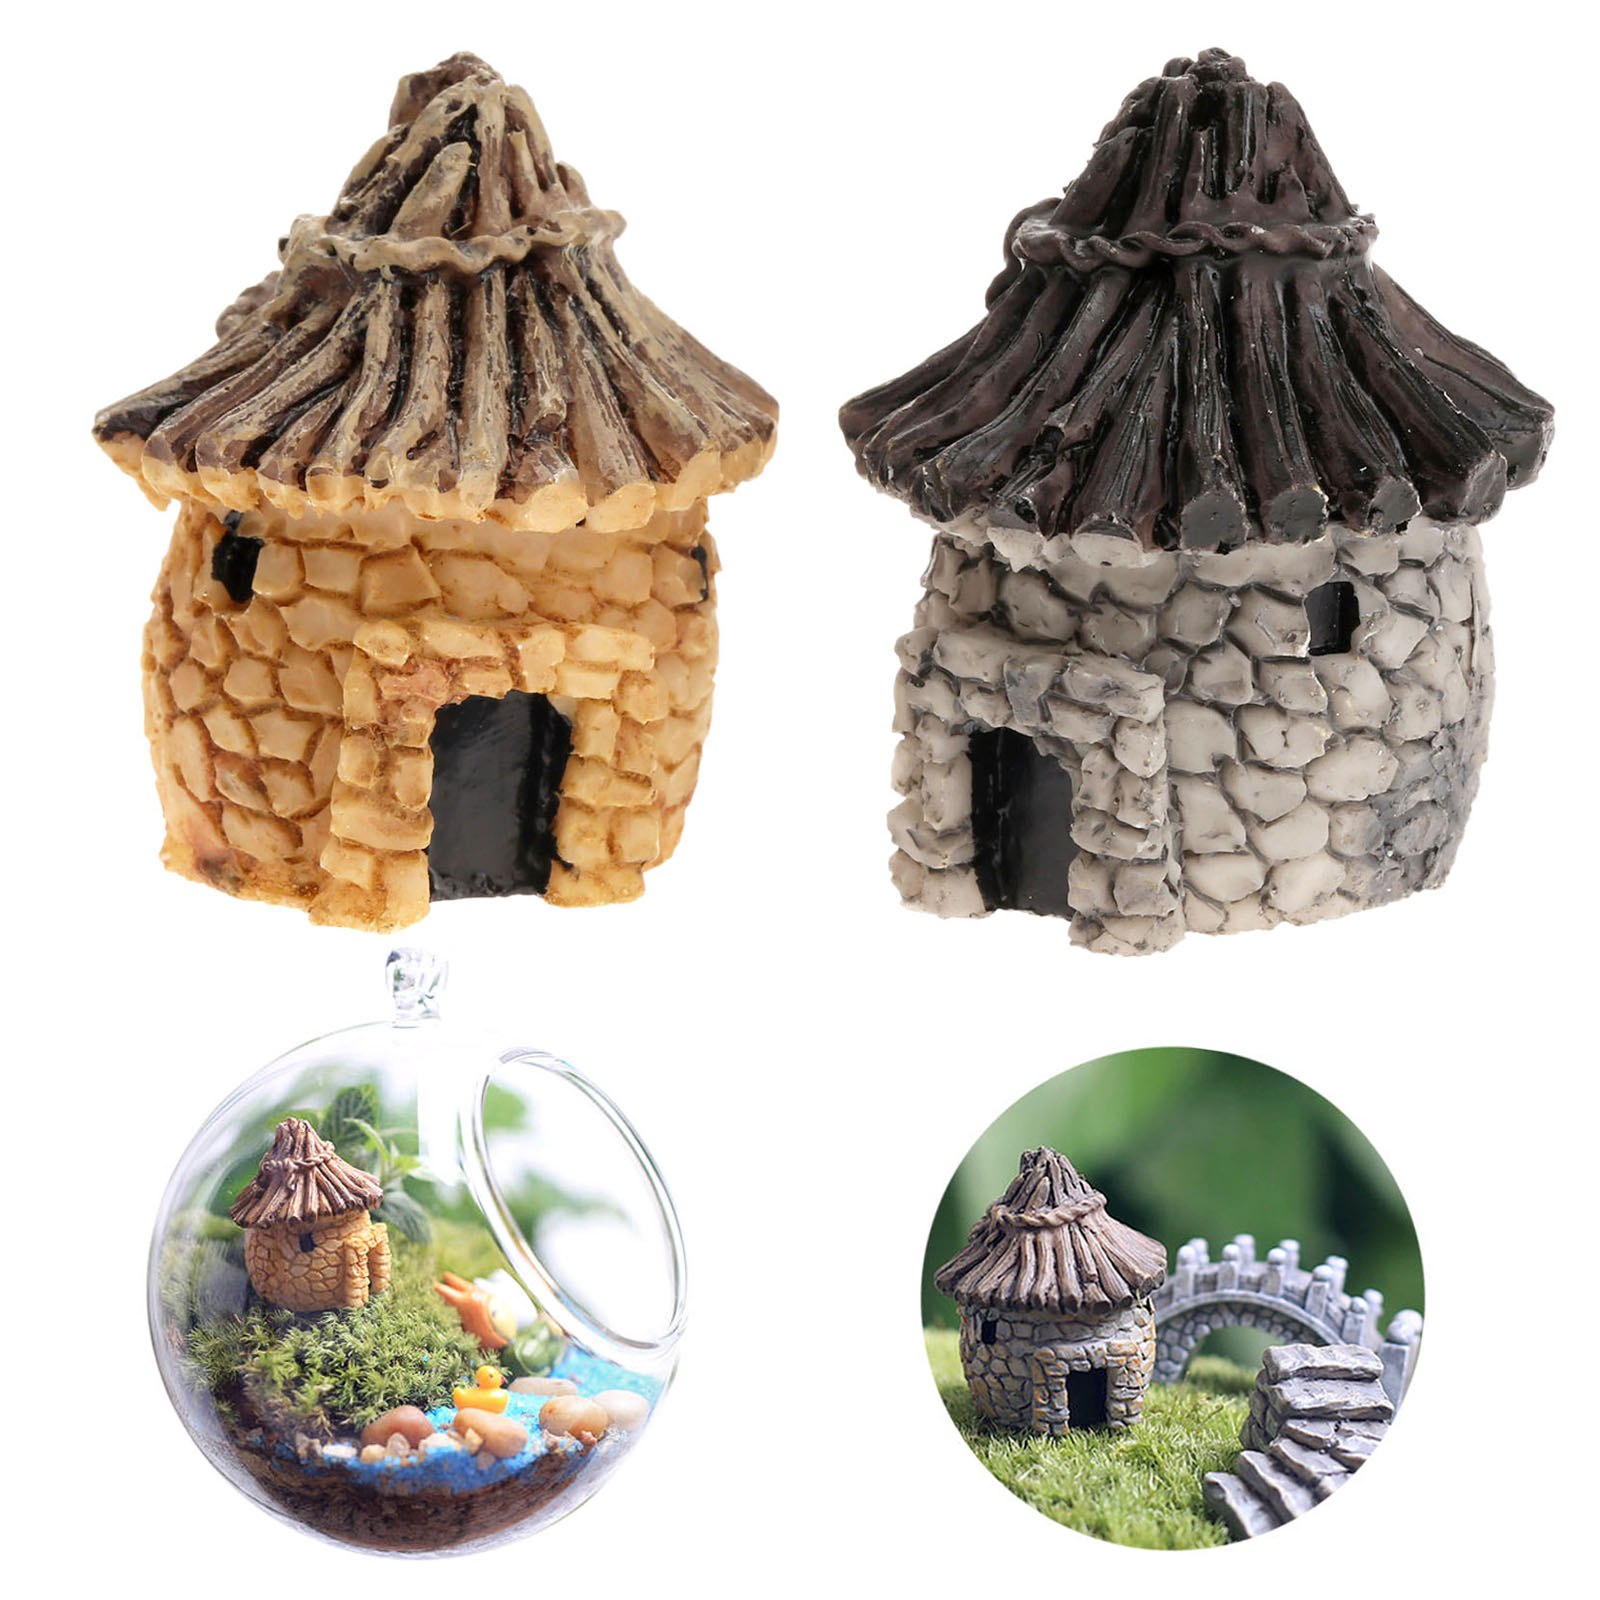 New fashion cute resin crafts house fairy garden miniatures gnome Micro landscape decor bonsai for home decor